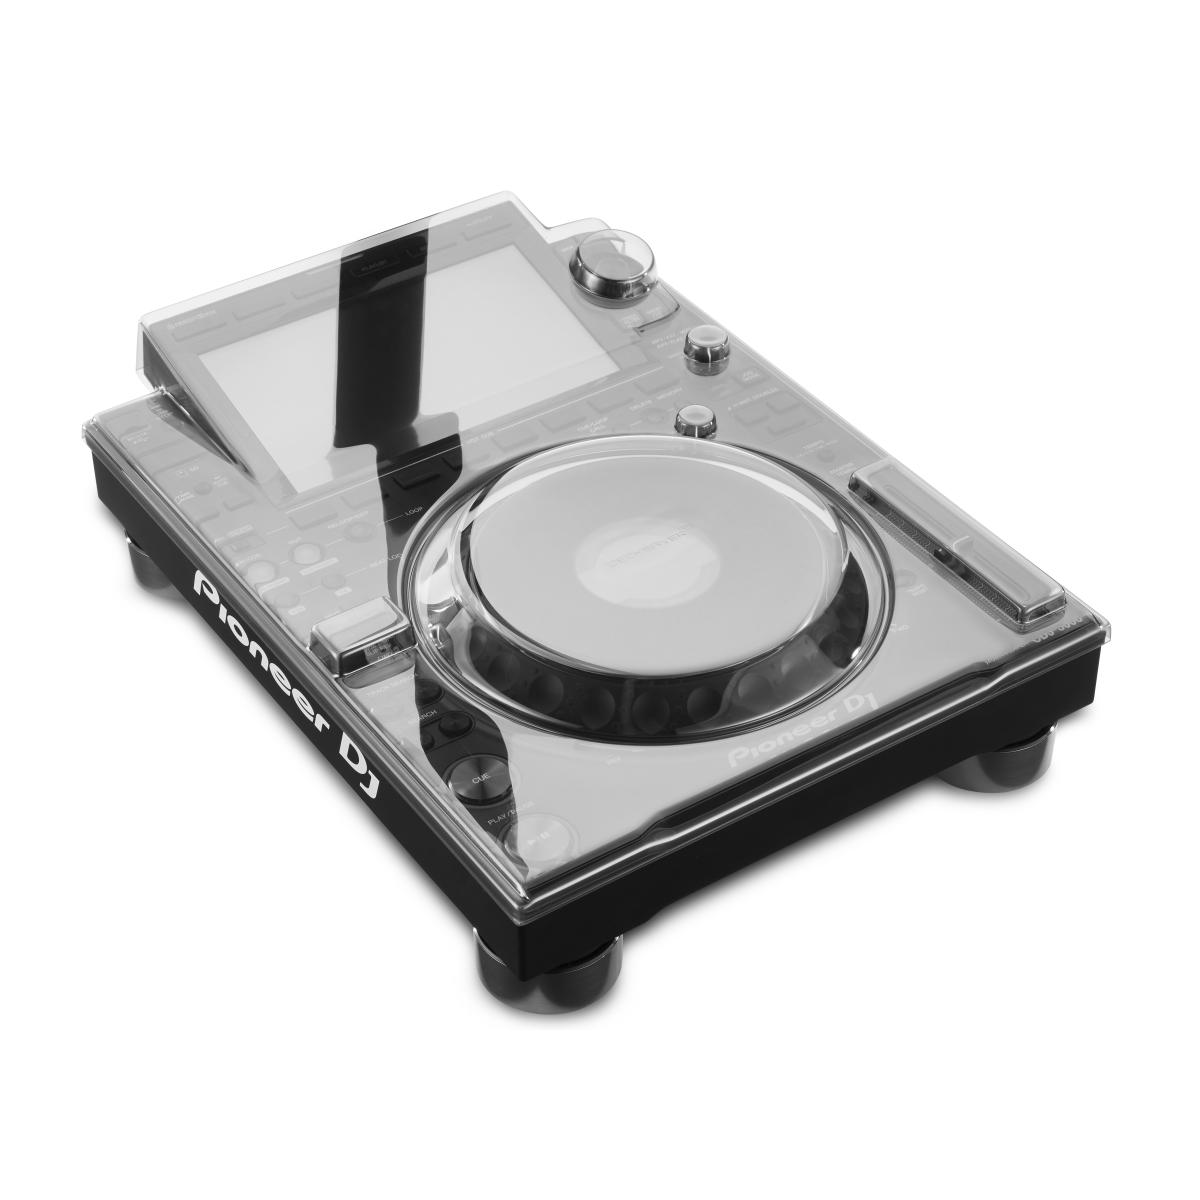 Decksavers - DeckSaver - CDJ3000 TRANSPARENT